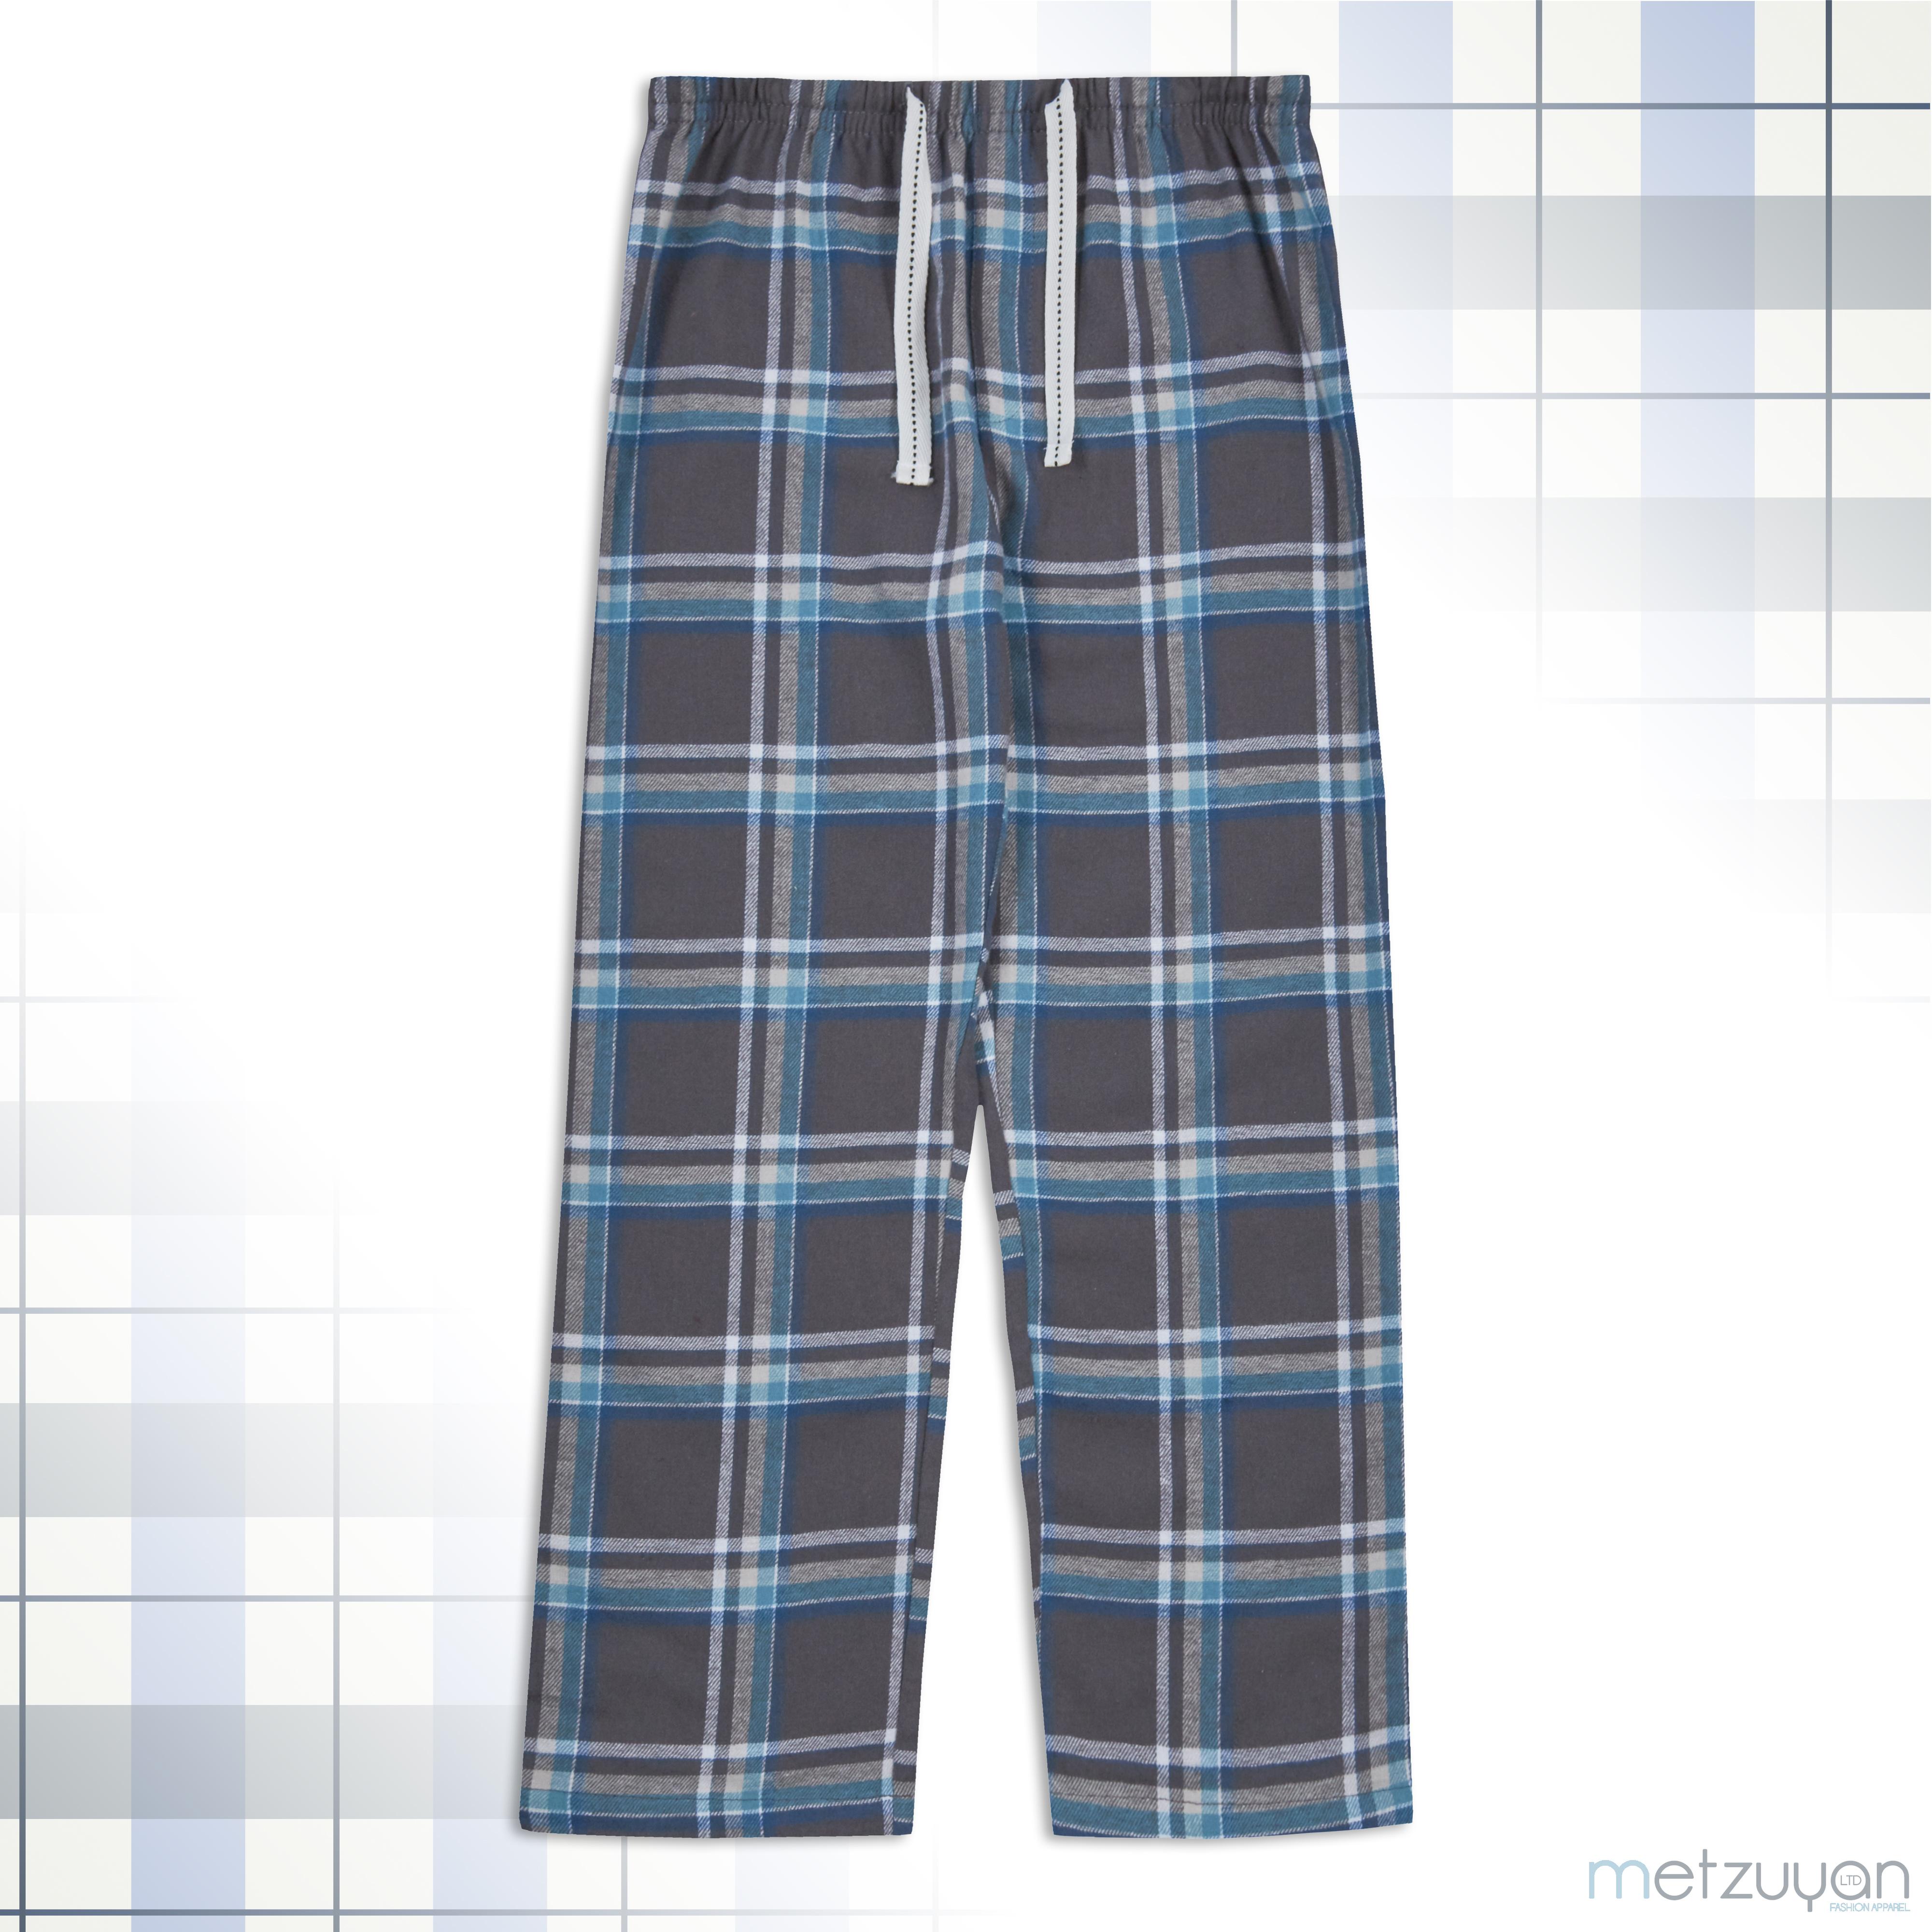 Childrens Boys Microfleece Pyjama Lounge Wear Set Warm Long Sleeve UK 7-13 Years